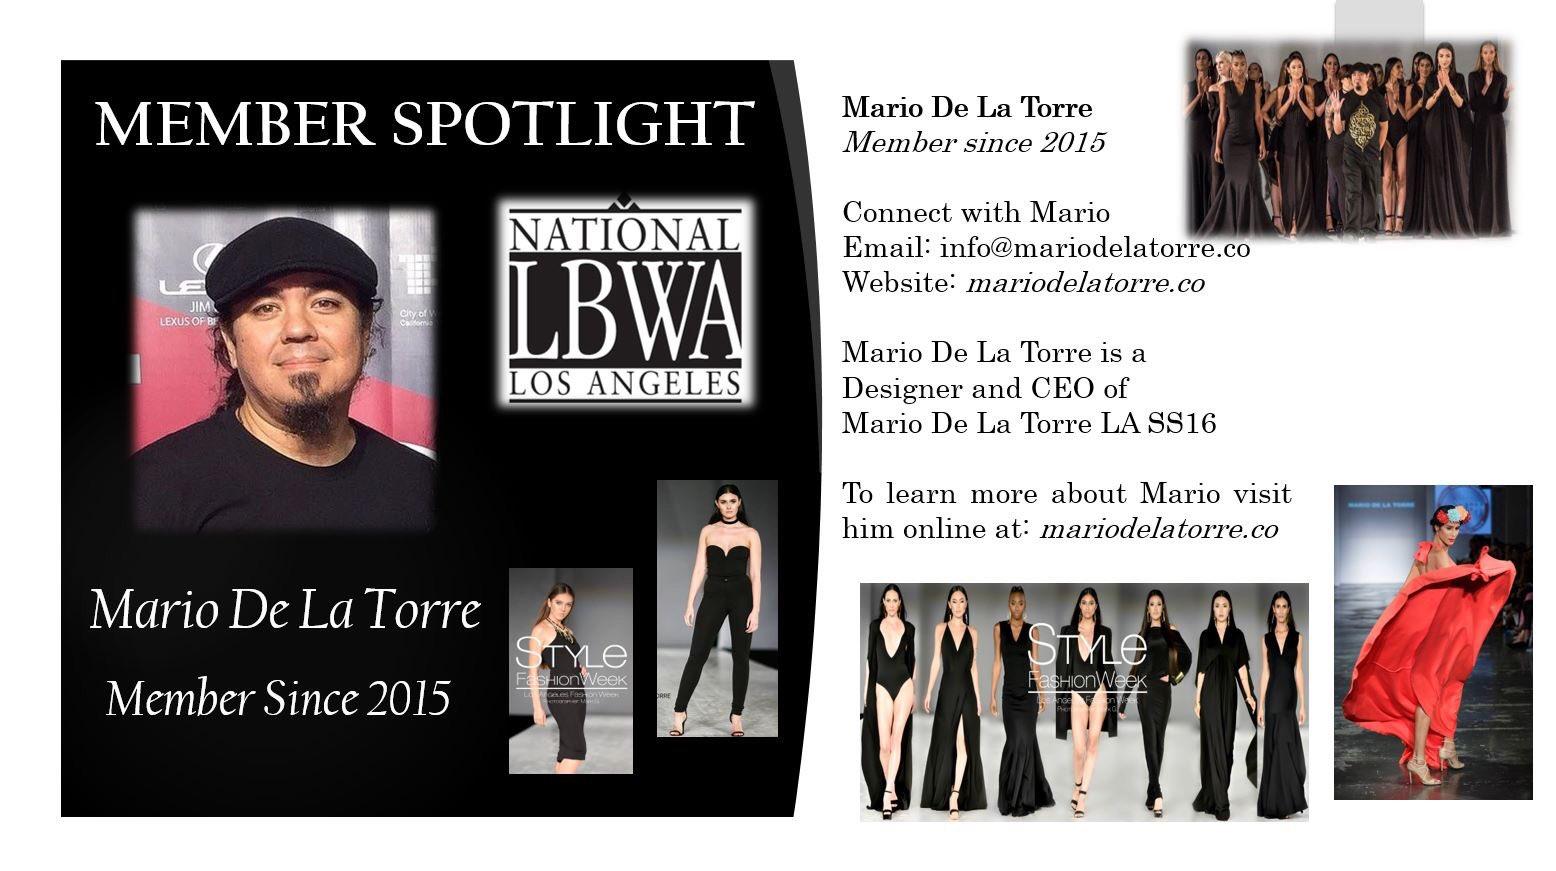 Nlbwa Los Angeles On Twitter Member Spotlight Designer Mario De La Torre Visit Mario Online Https T Co Hrljx3w6zh Memberspotlight Nlbwala